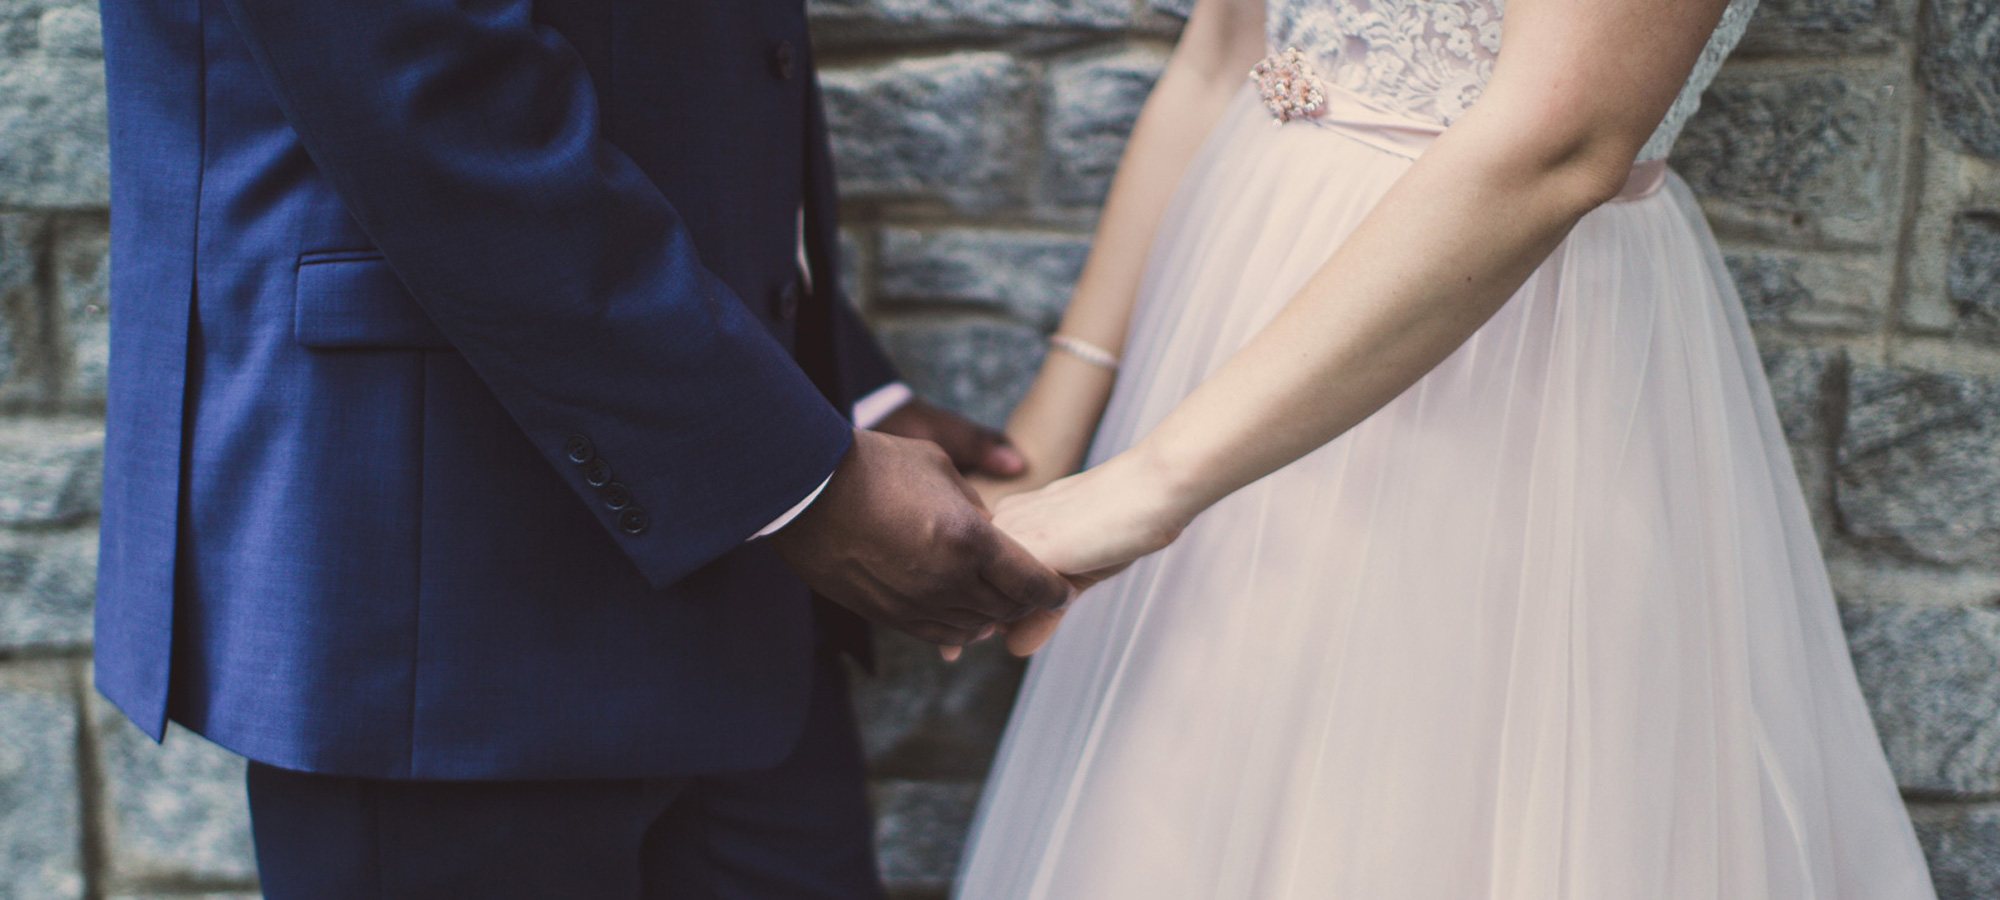 Photo of a wedding couple